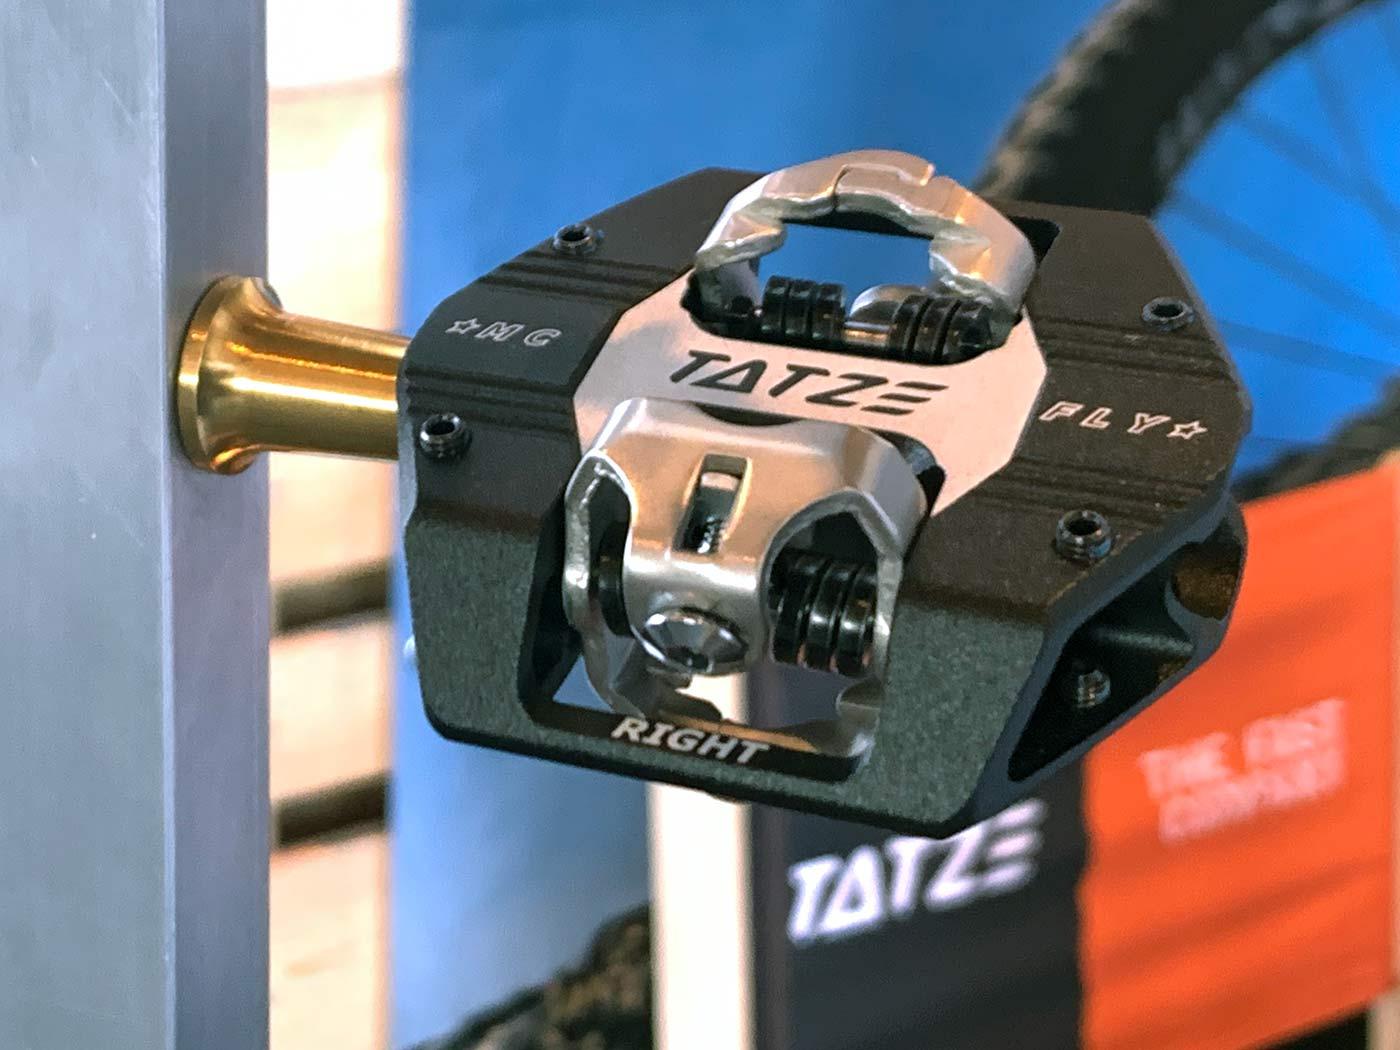 tatze xc mountain bike pedal with pins